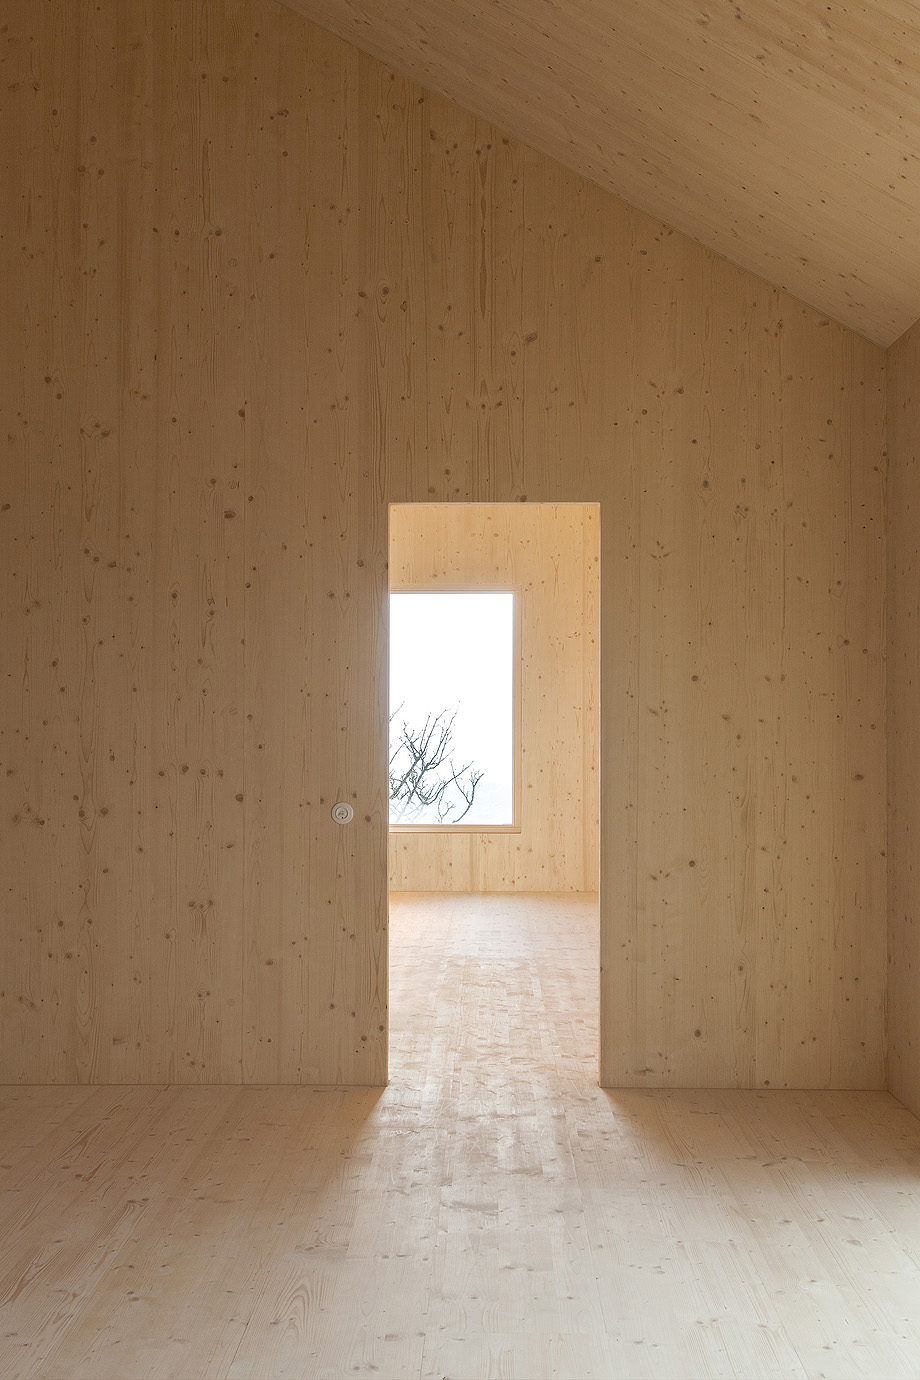 casa pasiva de atelier ordinaire - foto julien renault (1)